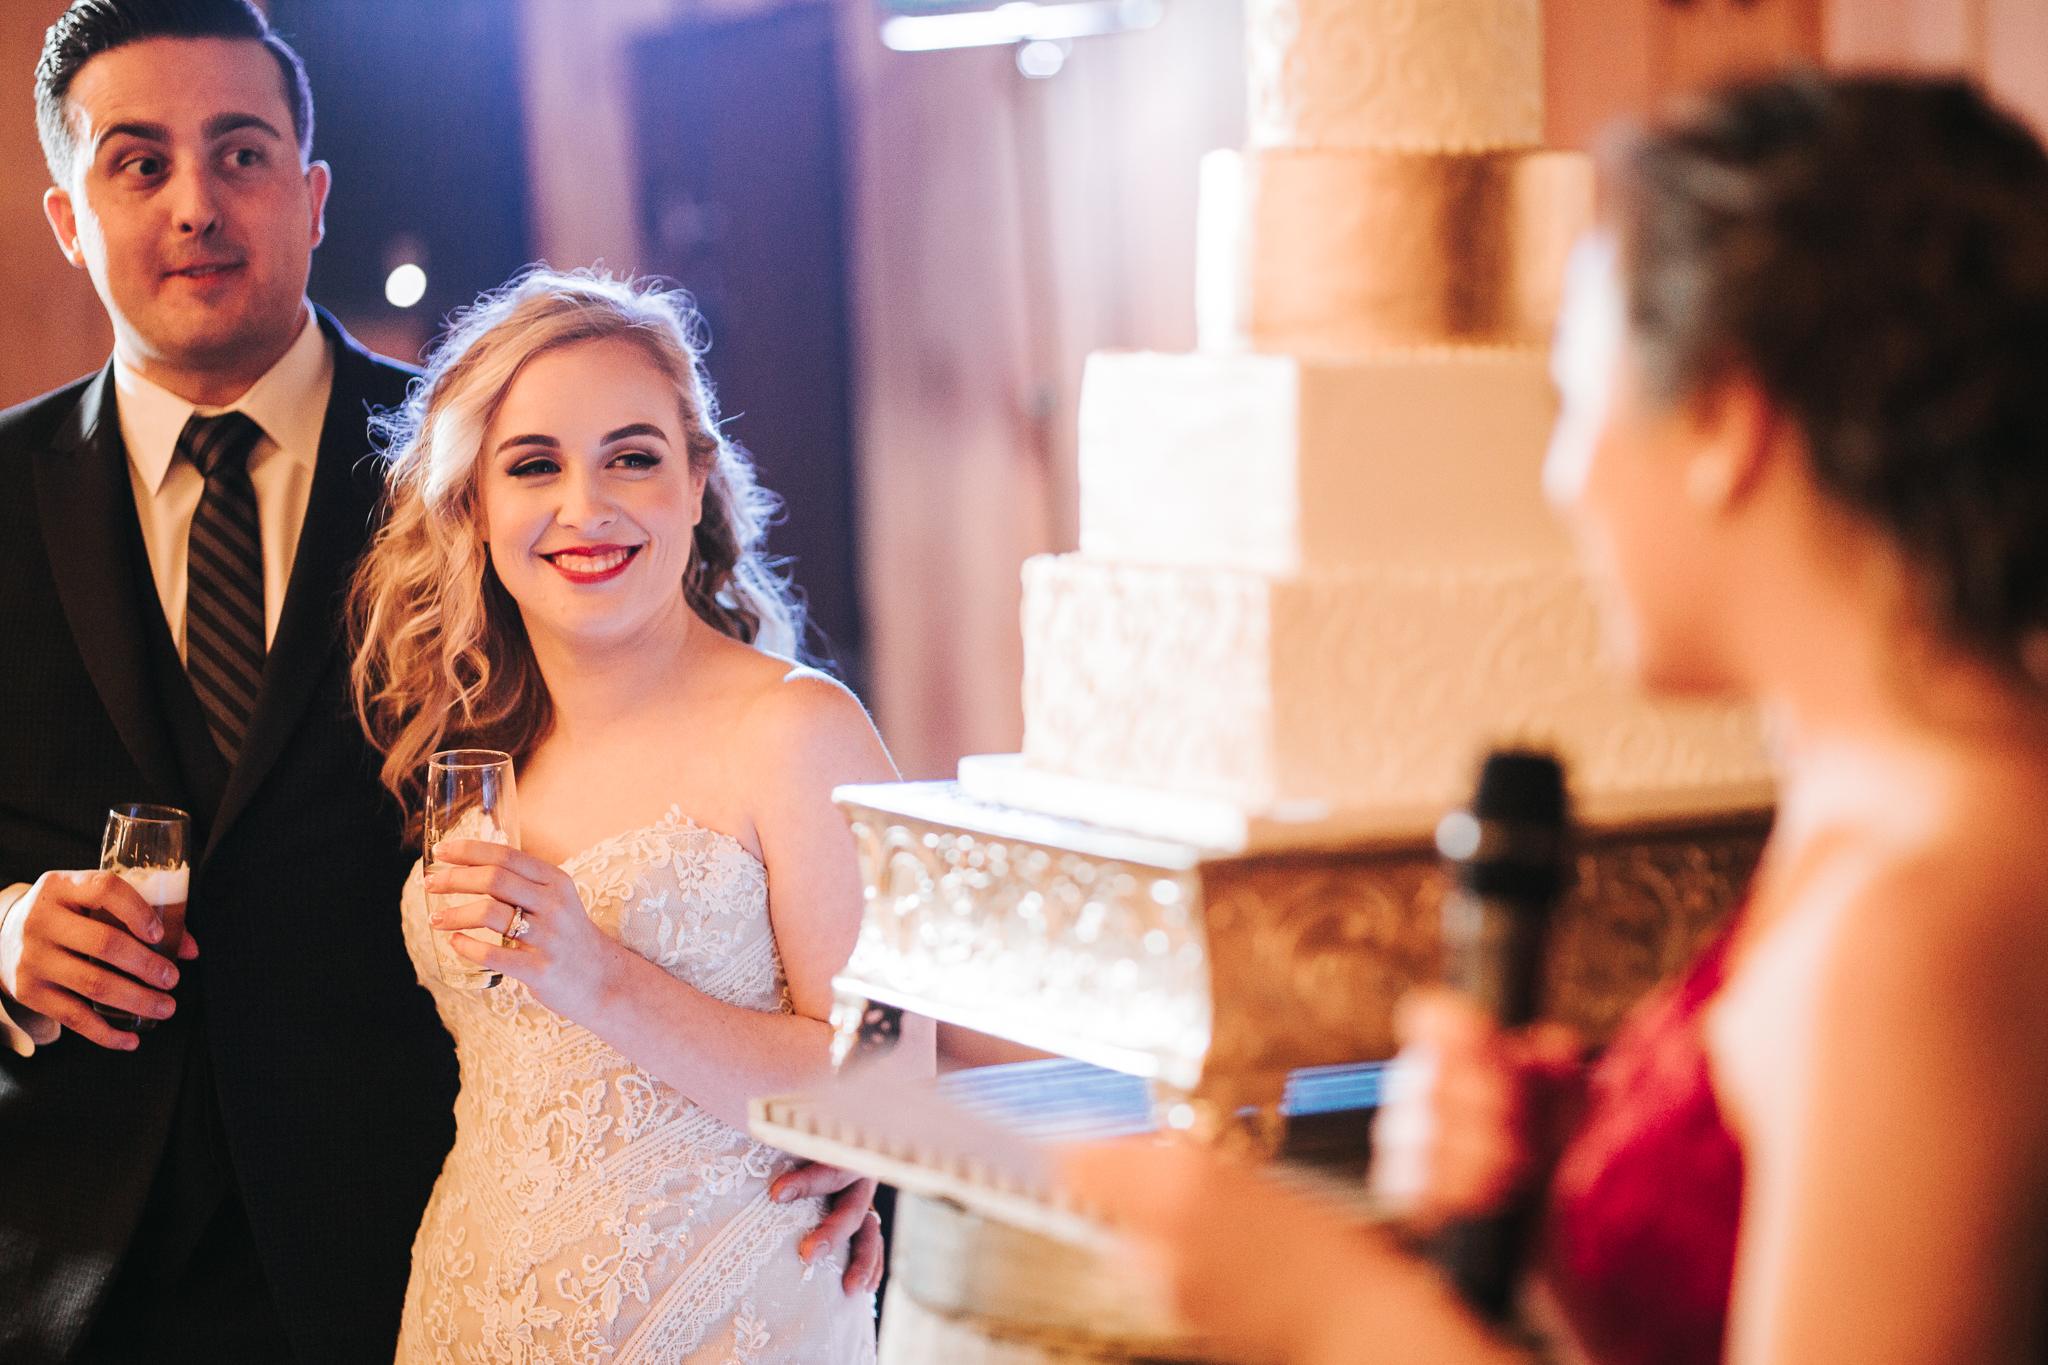 0159 Ariana Jordan Photo - Cameron & Lauren's Wedding at Talon Winery  4634.jpg